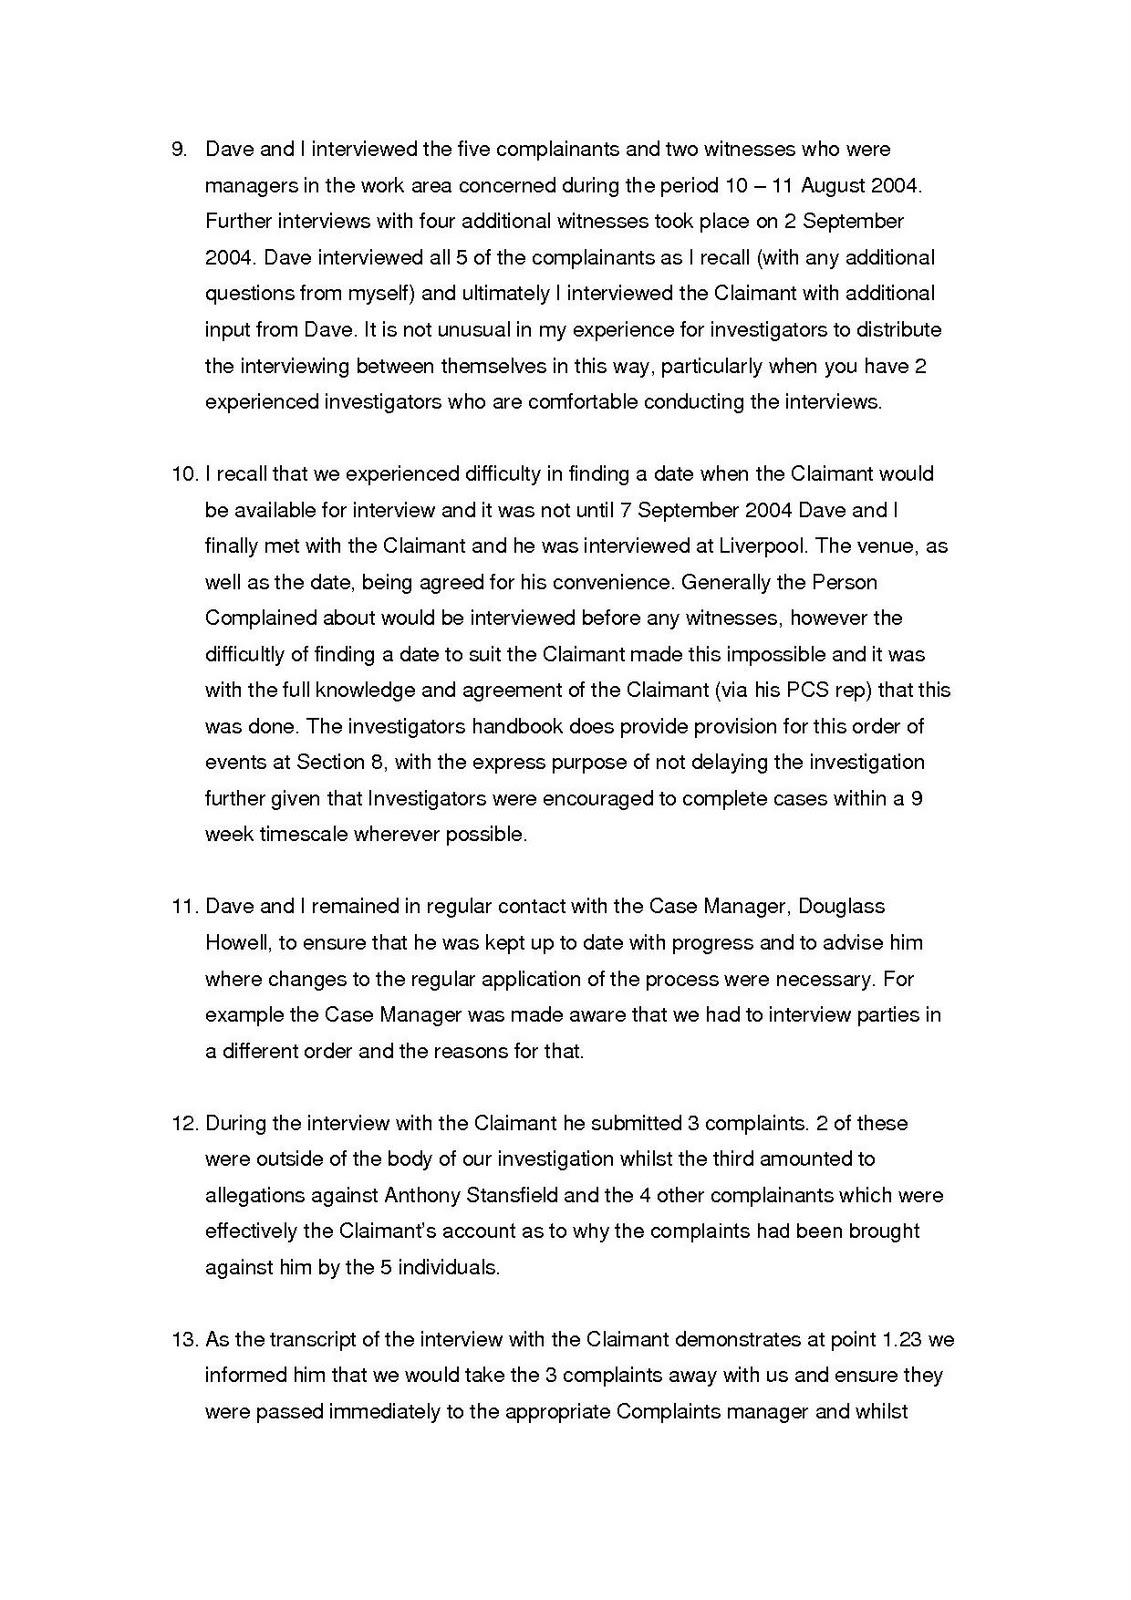 Witness 2012 hsc Essay